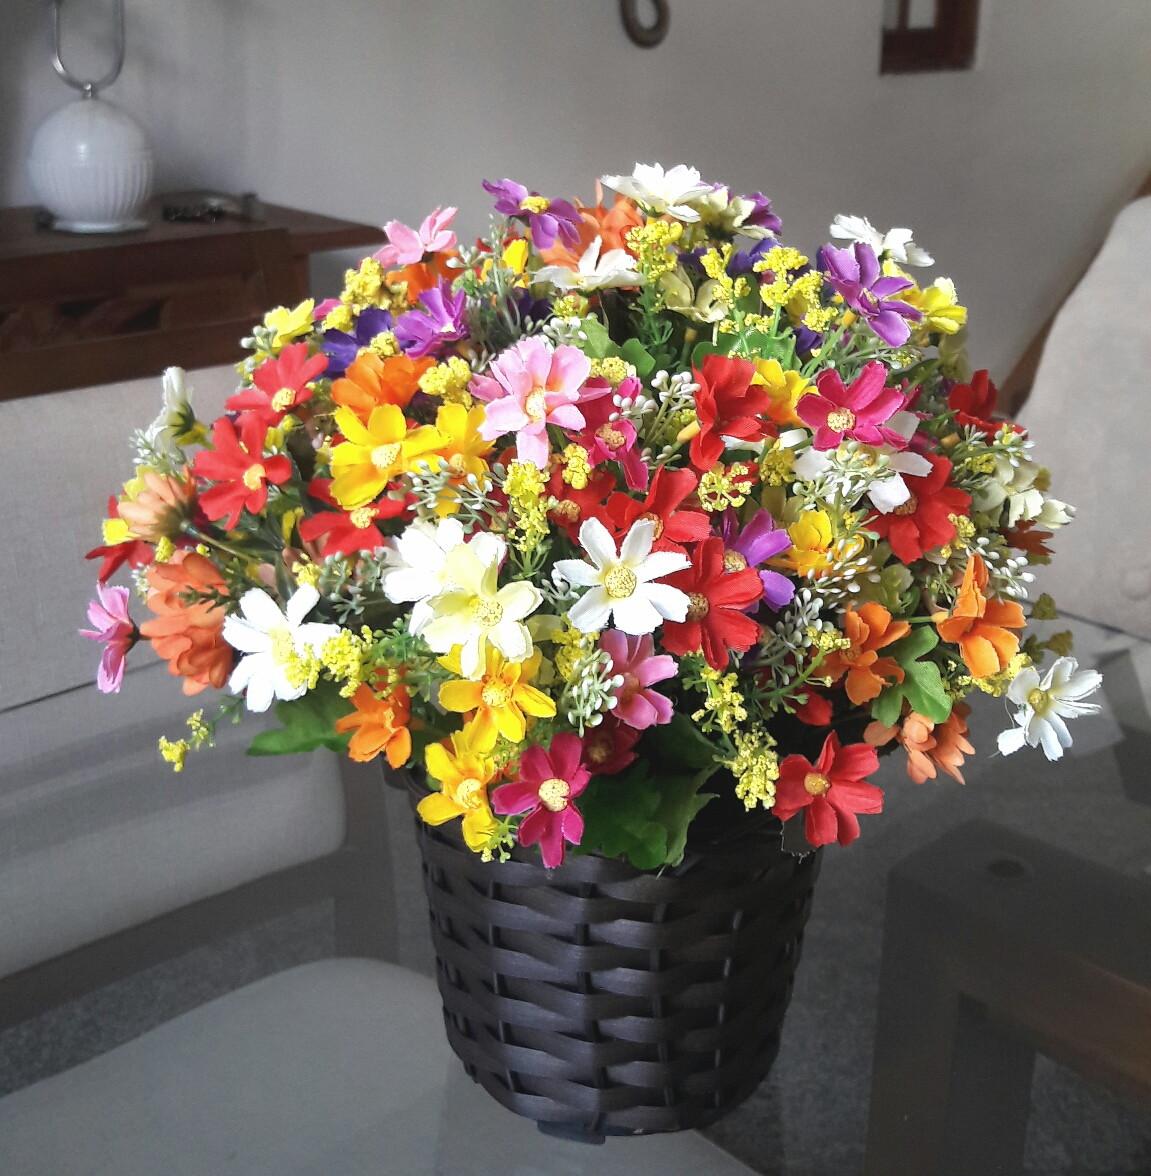 flores do campo artificiais